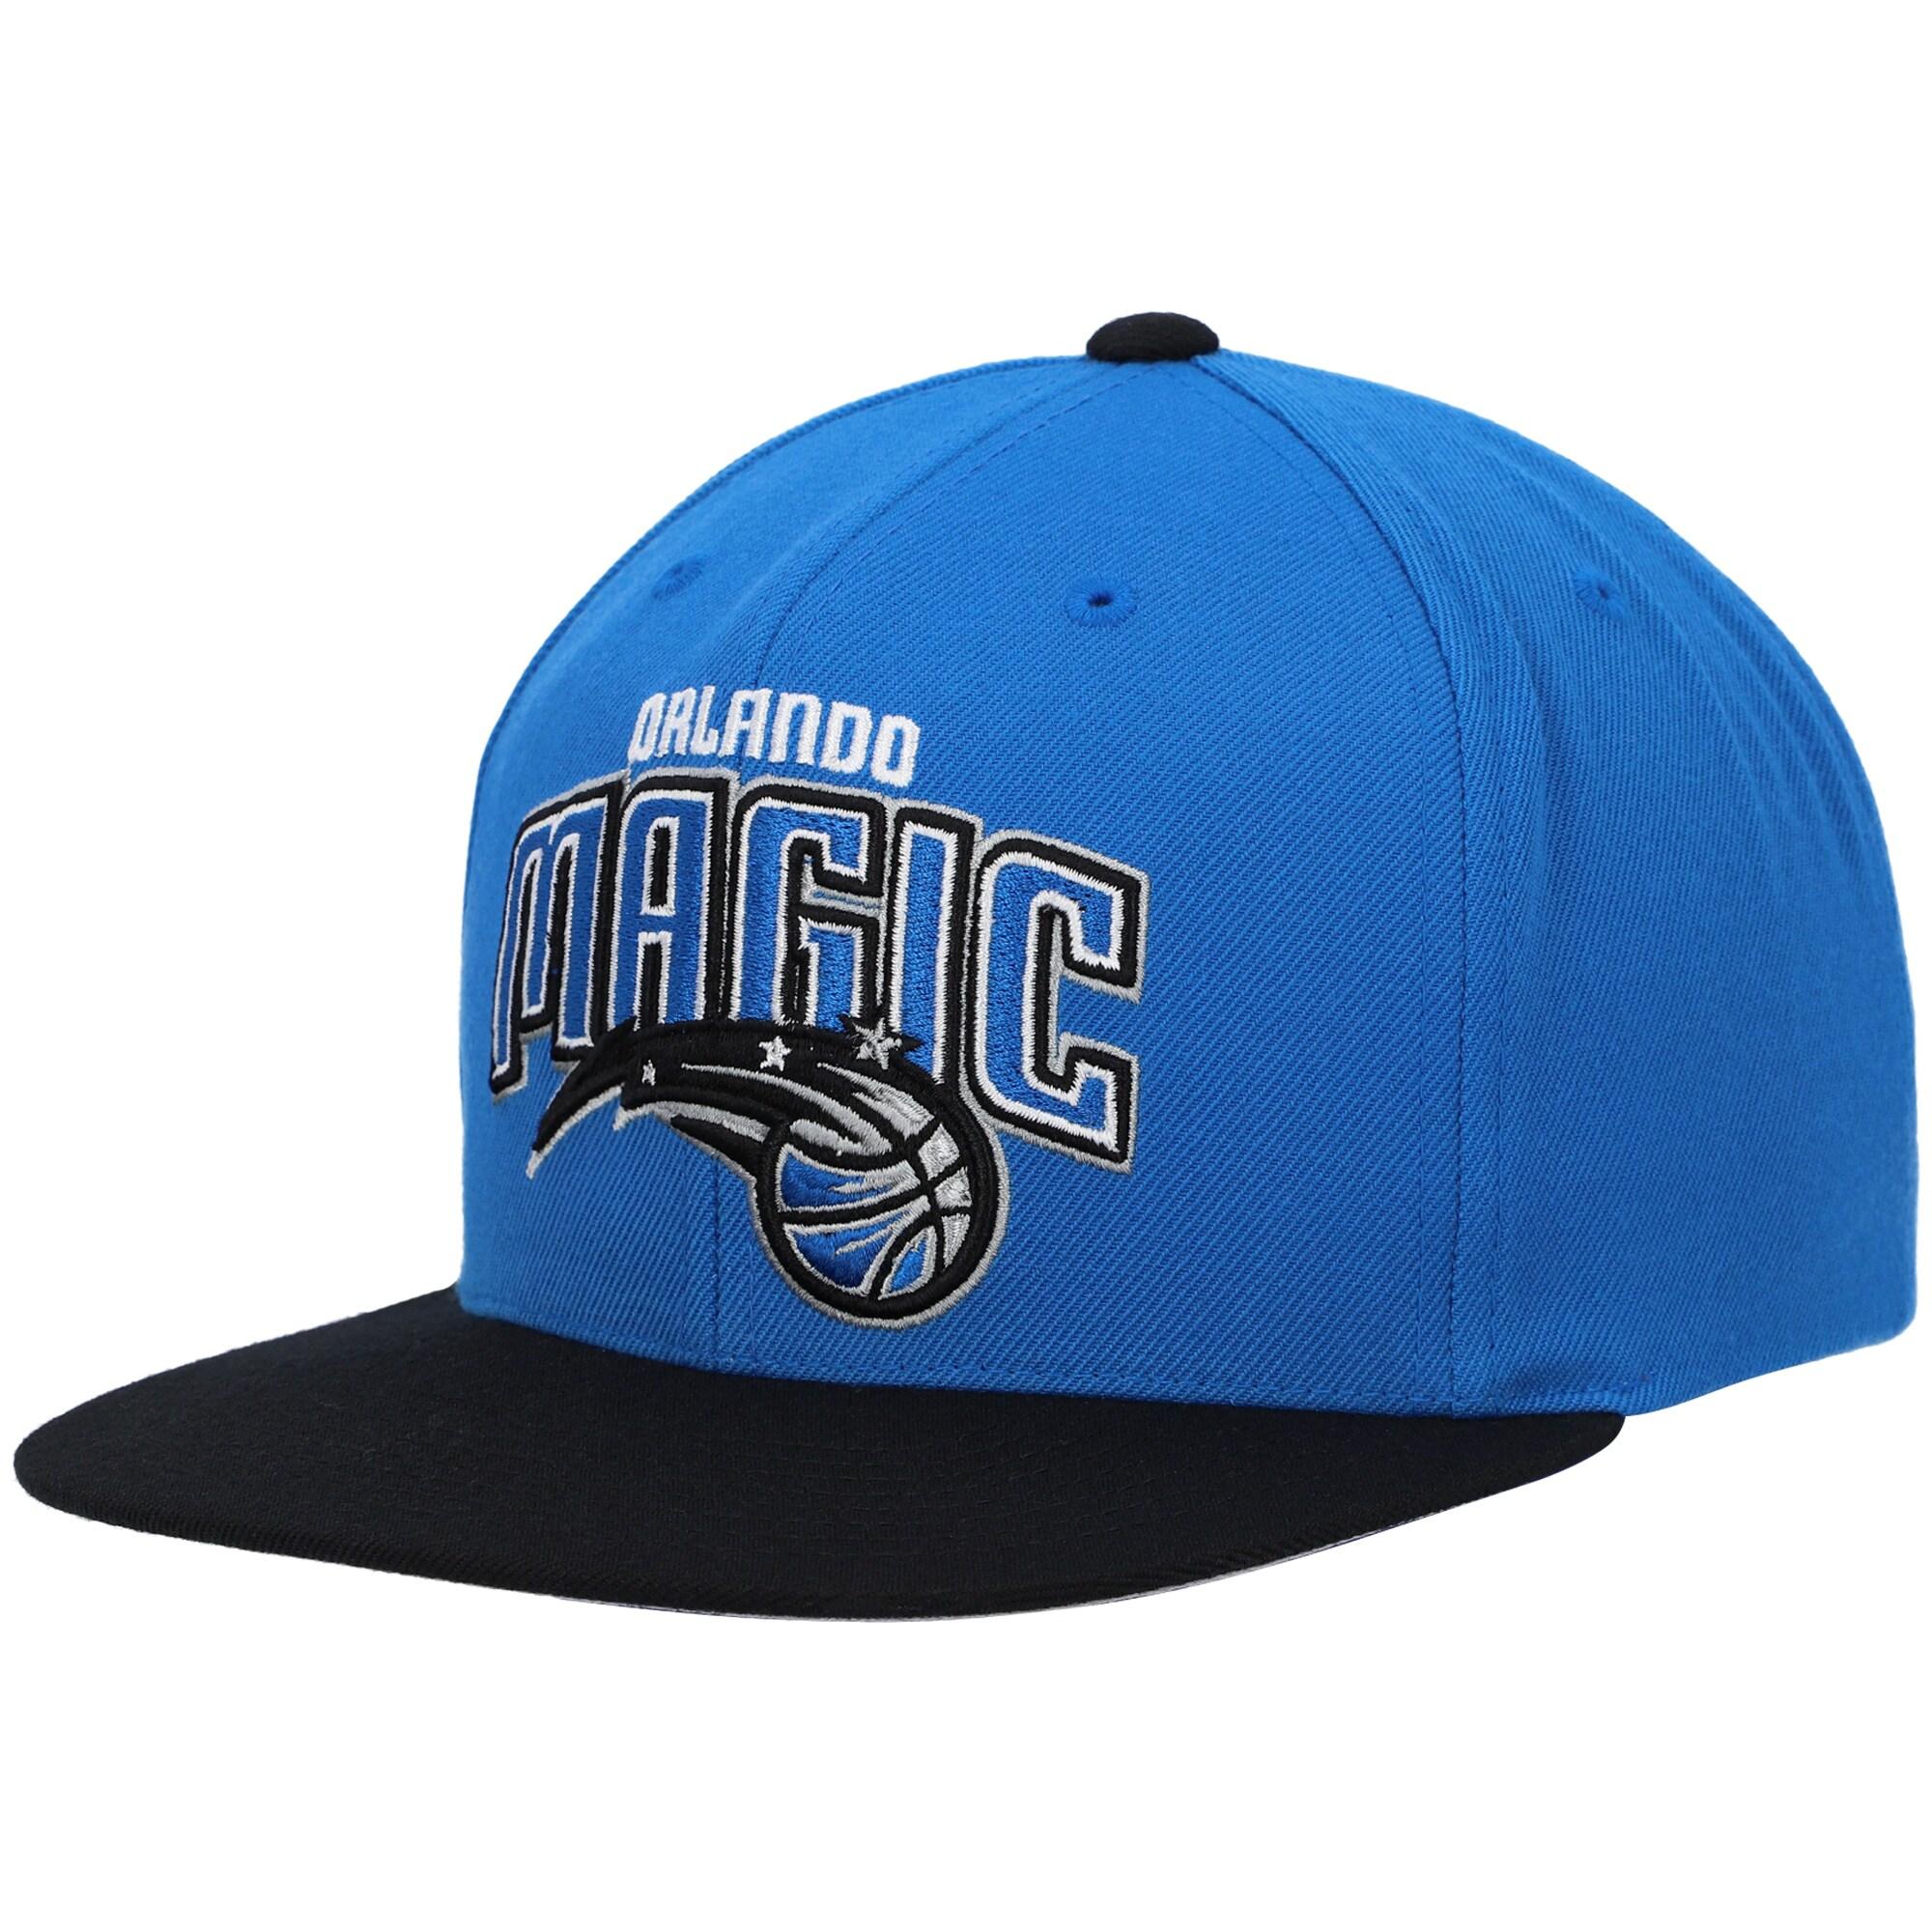 Orlando Magic Mitchell & Ness Two-Tone Wool Snapback Hat - Blue/Black